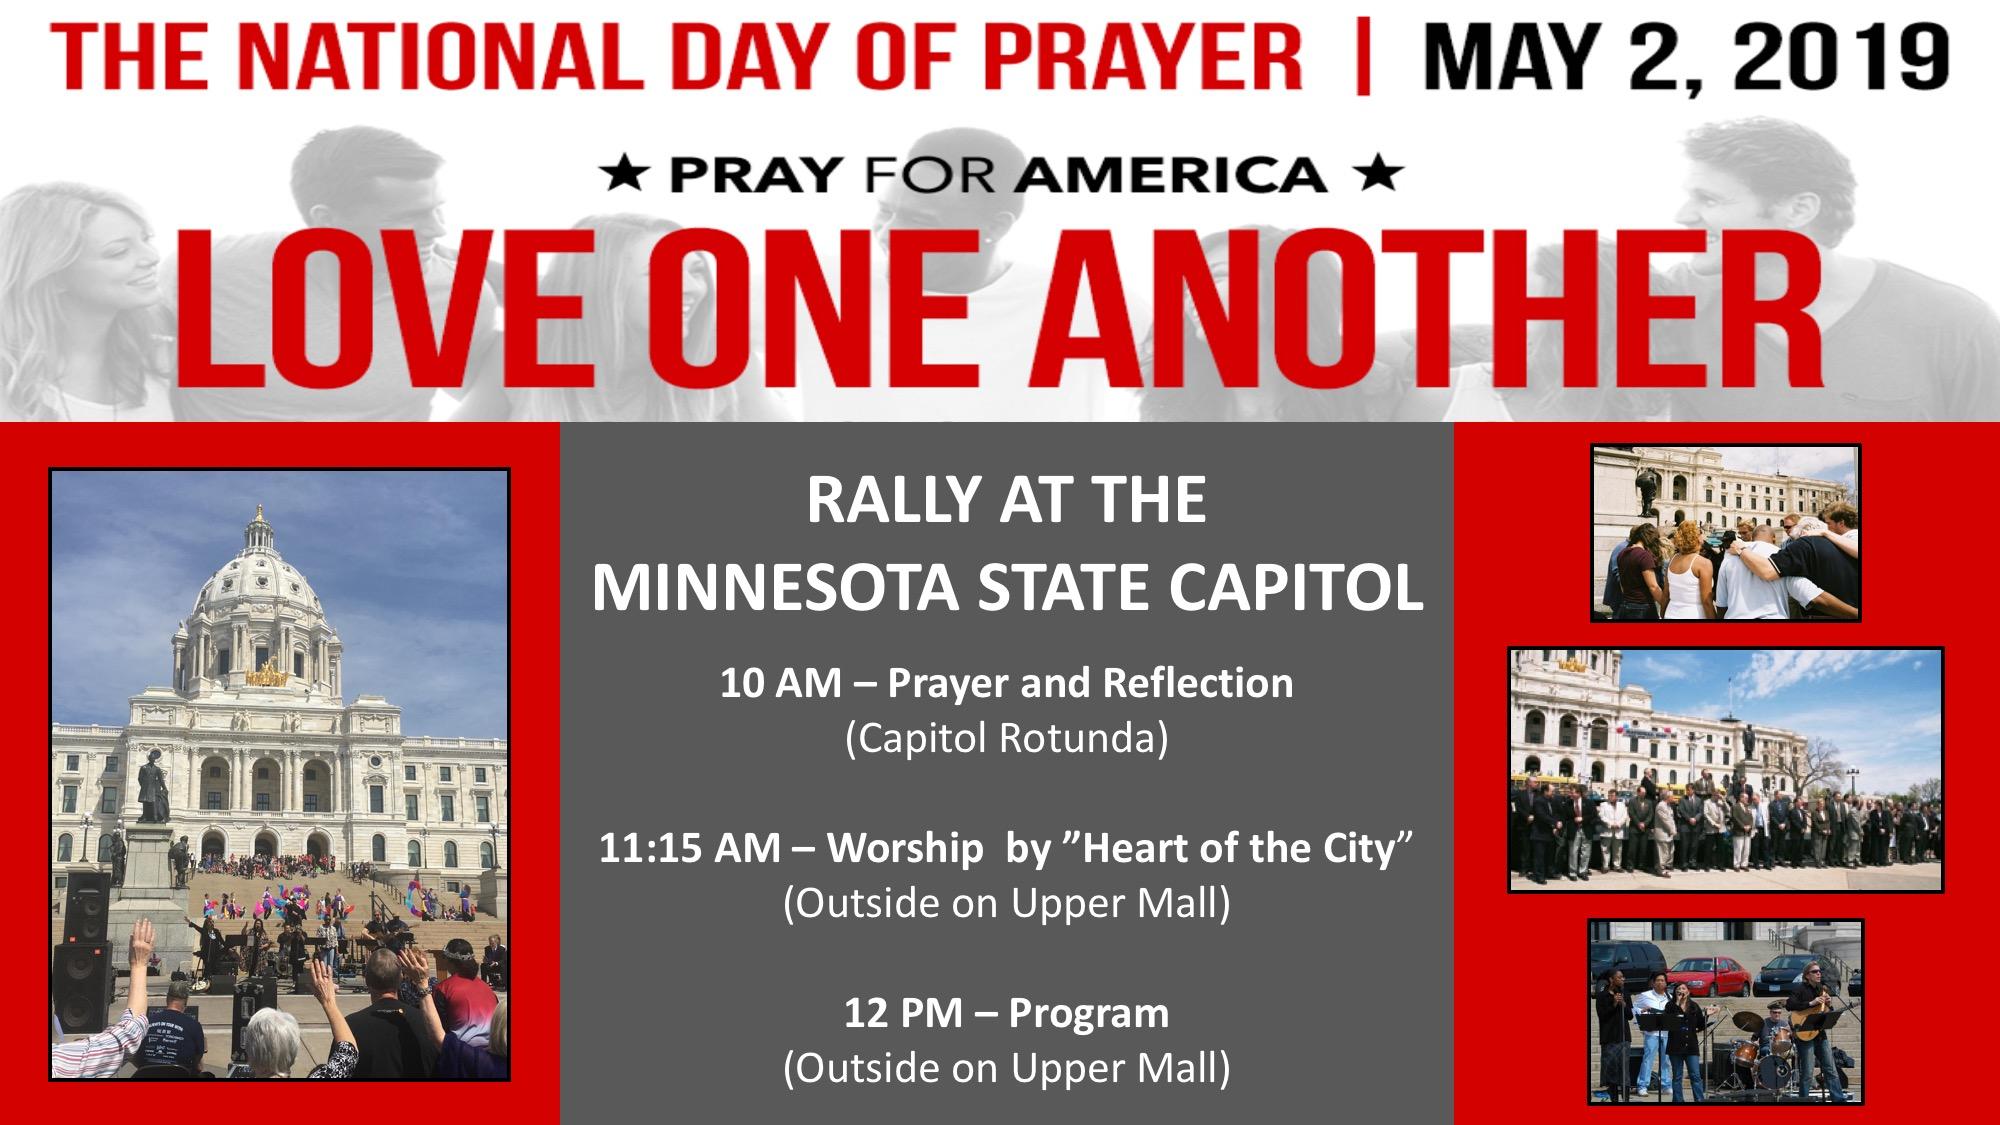 National Day of Prayer 2019 16x9.jpg